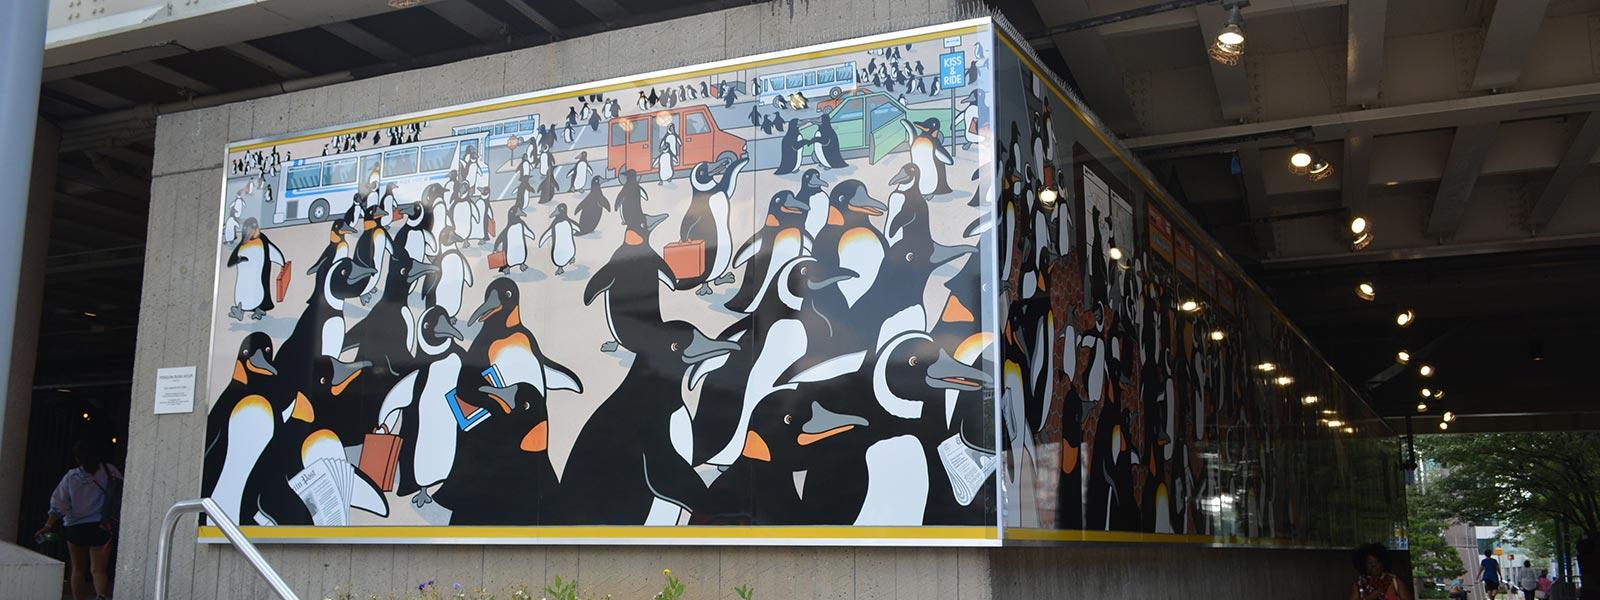 Public art in montgomery county image 6